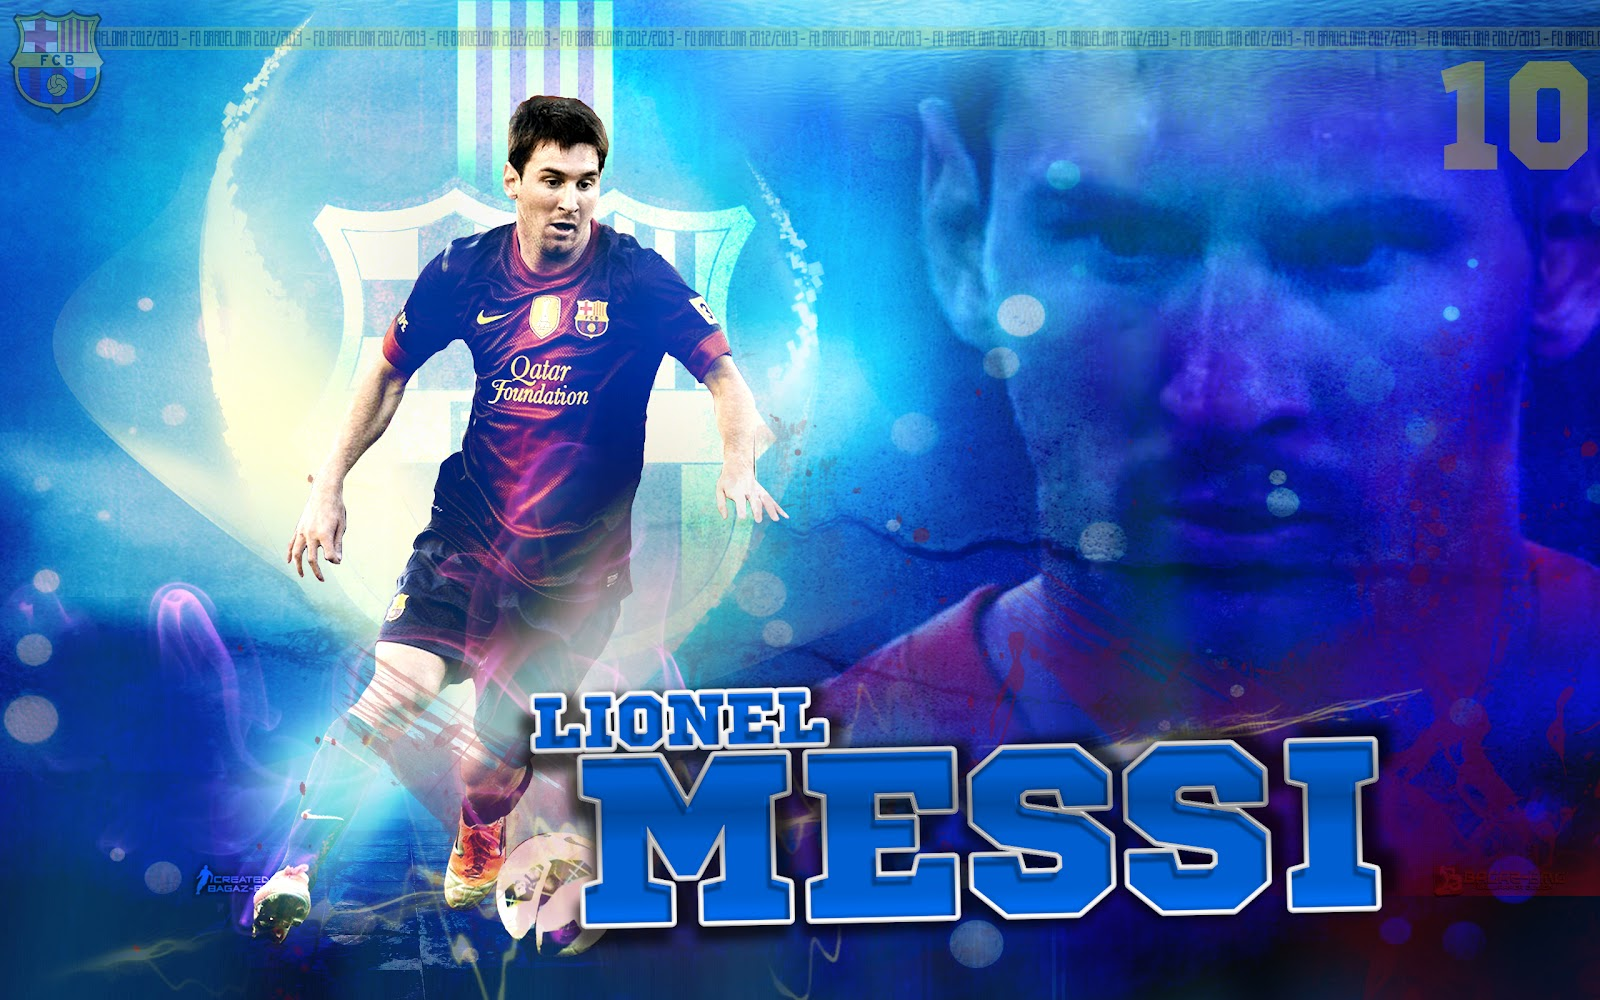 http://2.bp.blogspot.com/-6Jg_UAAwDDU/ULlEBH4yz-I/AAAAAAAAAFE/QzAc51a-Ax0/s1600/Lionel+Messi+Wallpapers+2.jpg